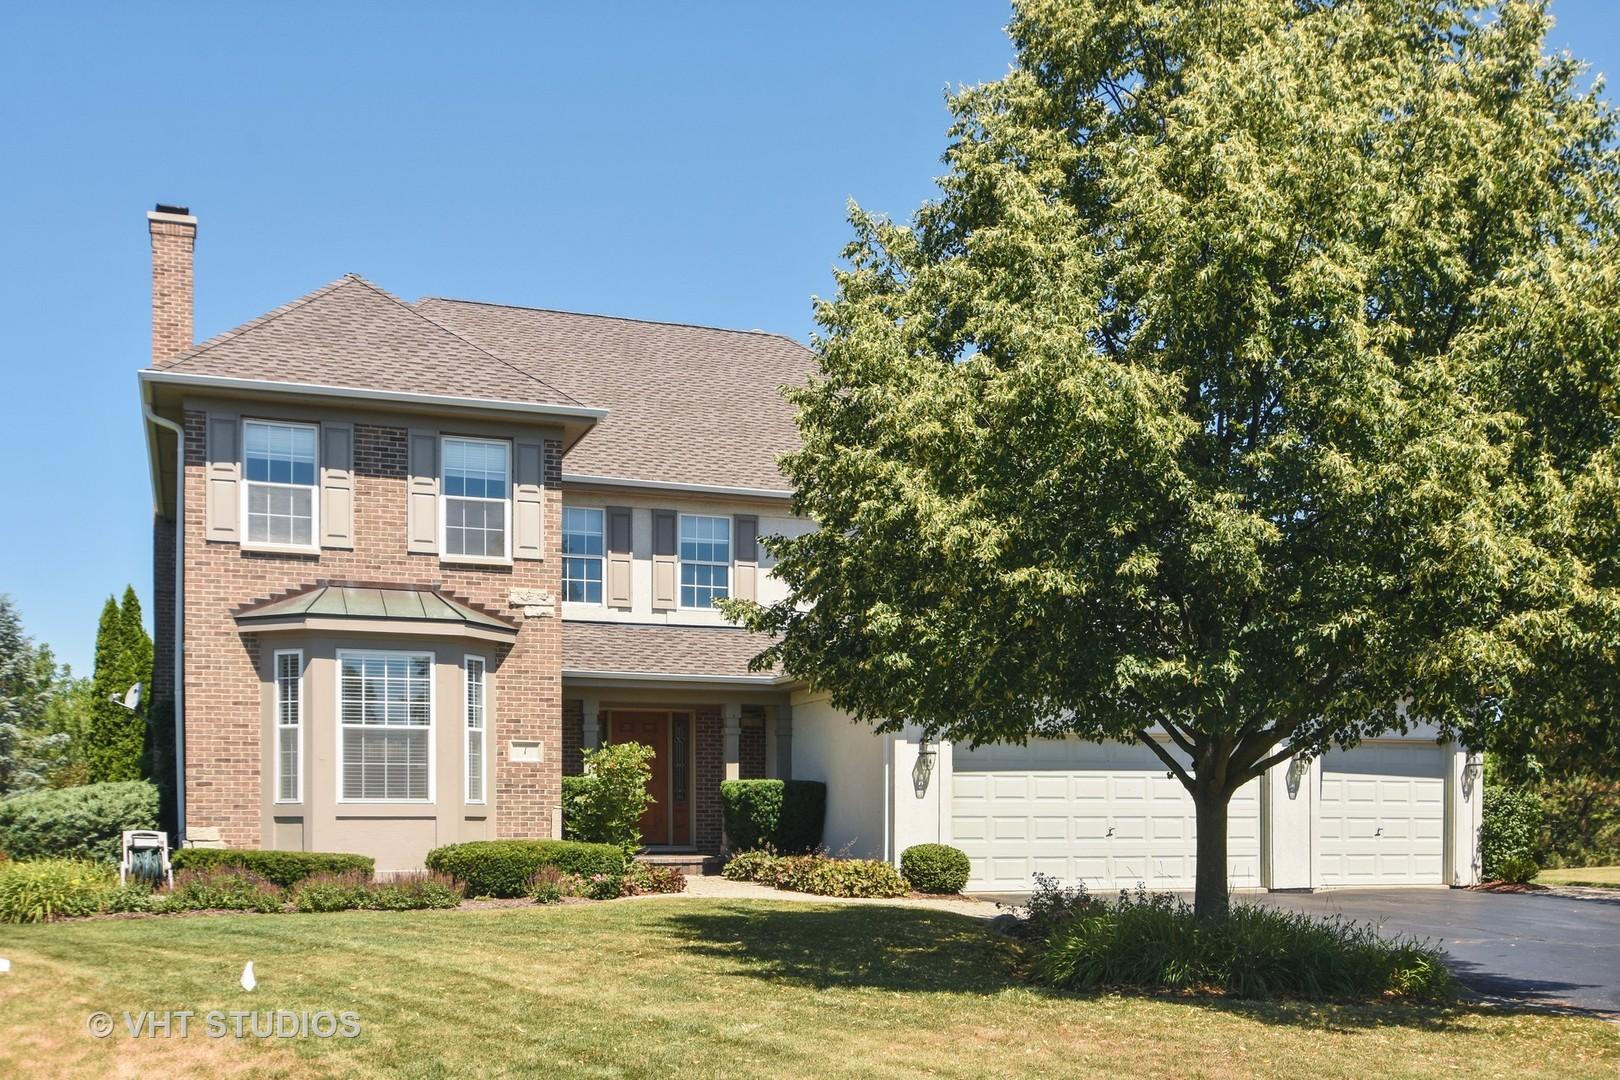 1 North Chestnut Court, Hawthorn Woods, Illinois 60047